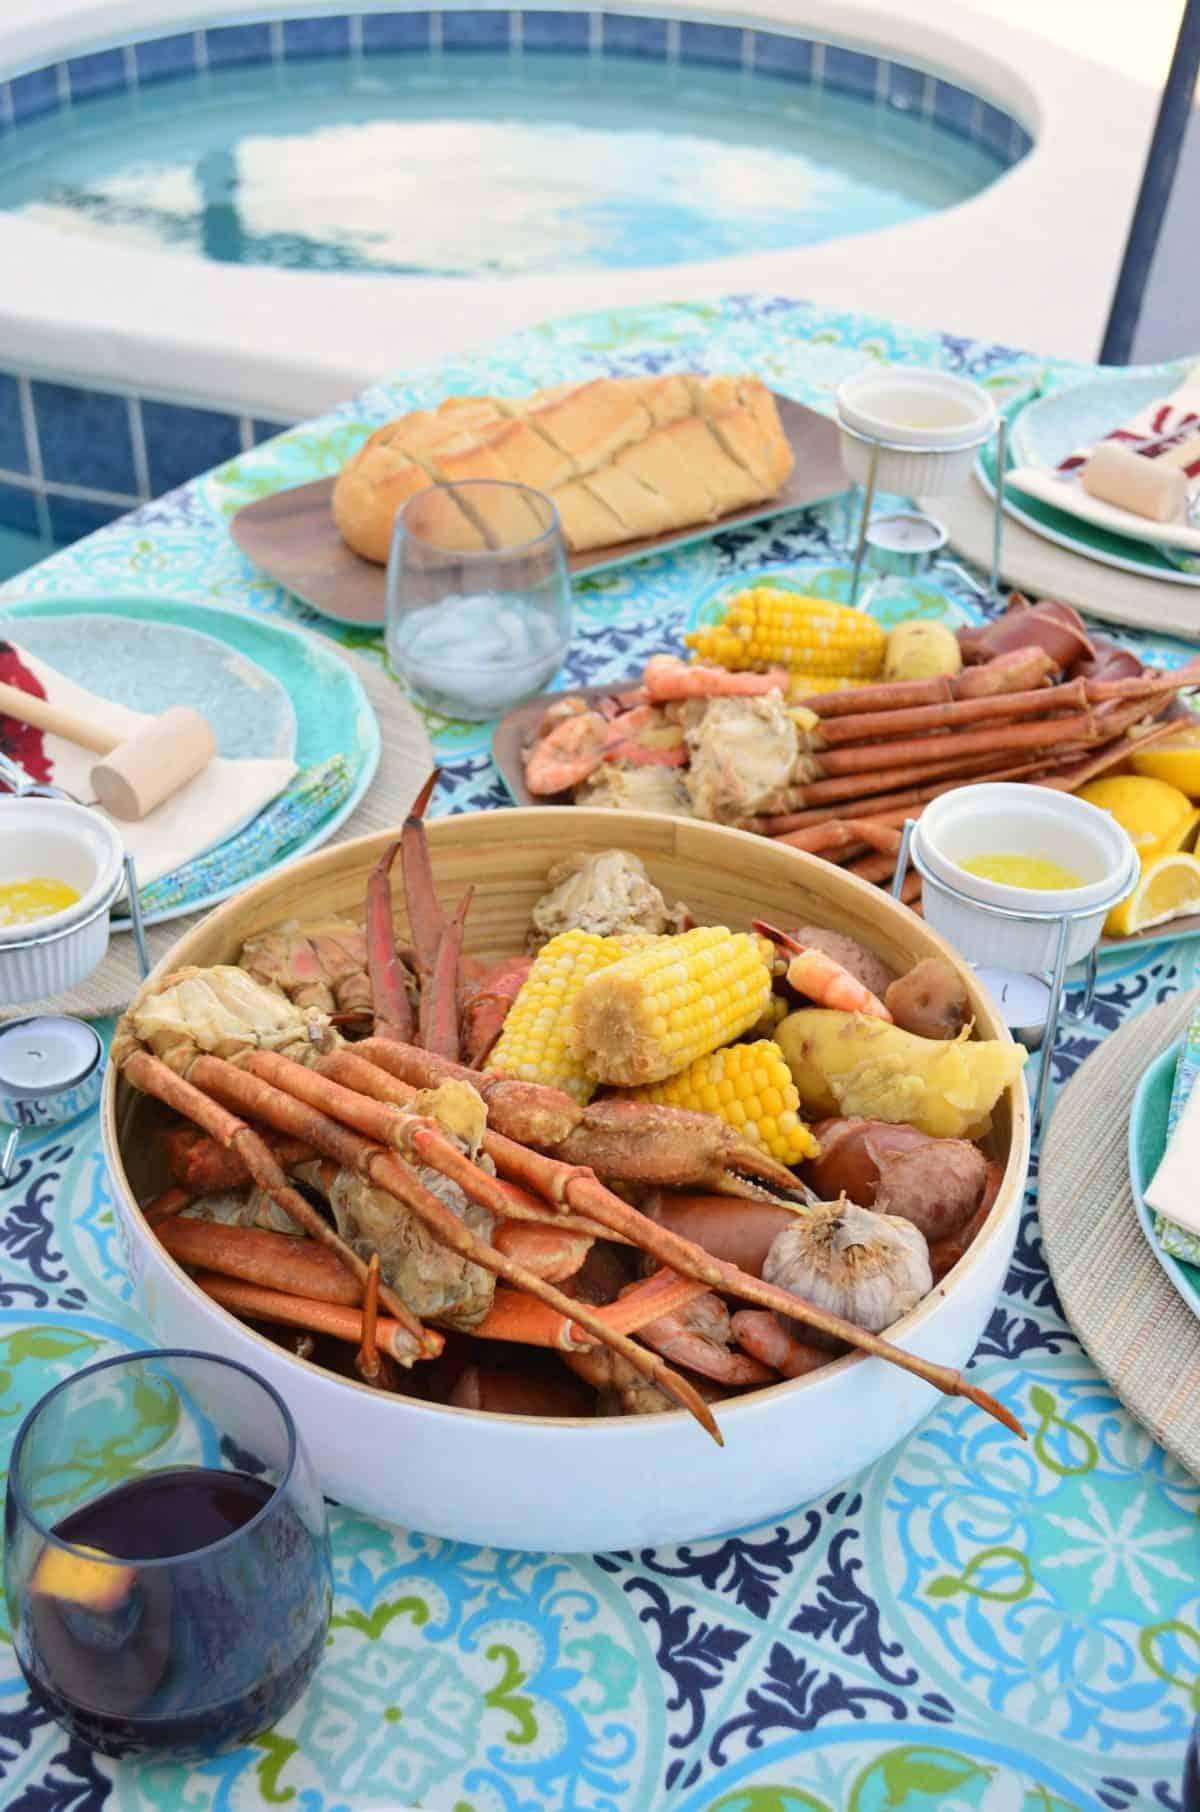 How To Host A Crab Leg & Shrimp Boil